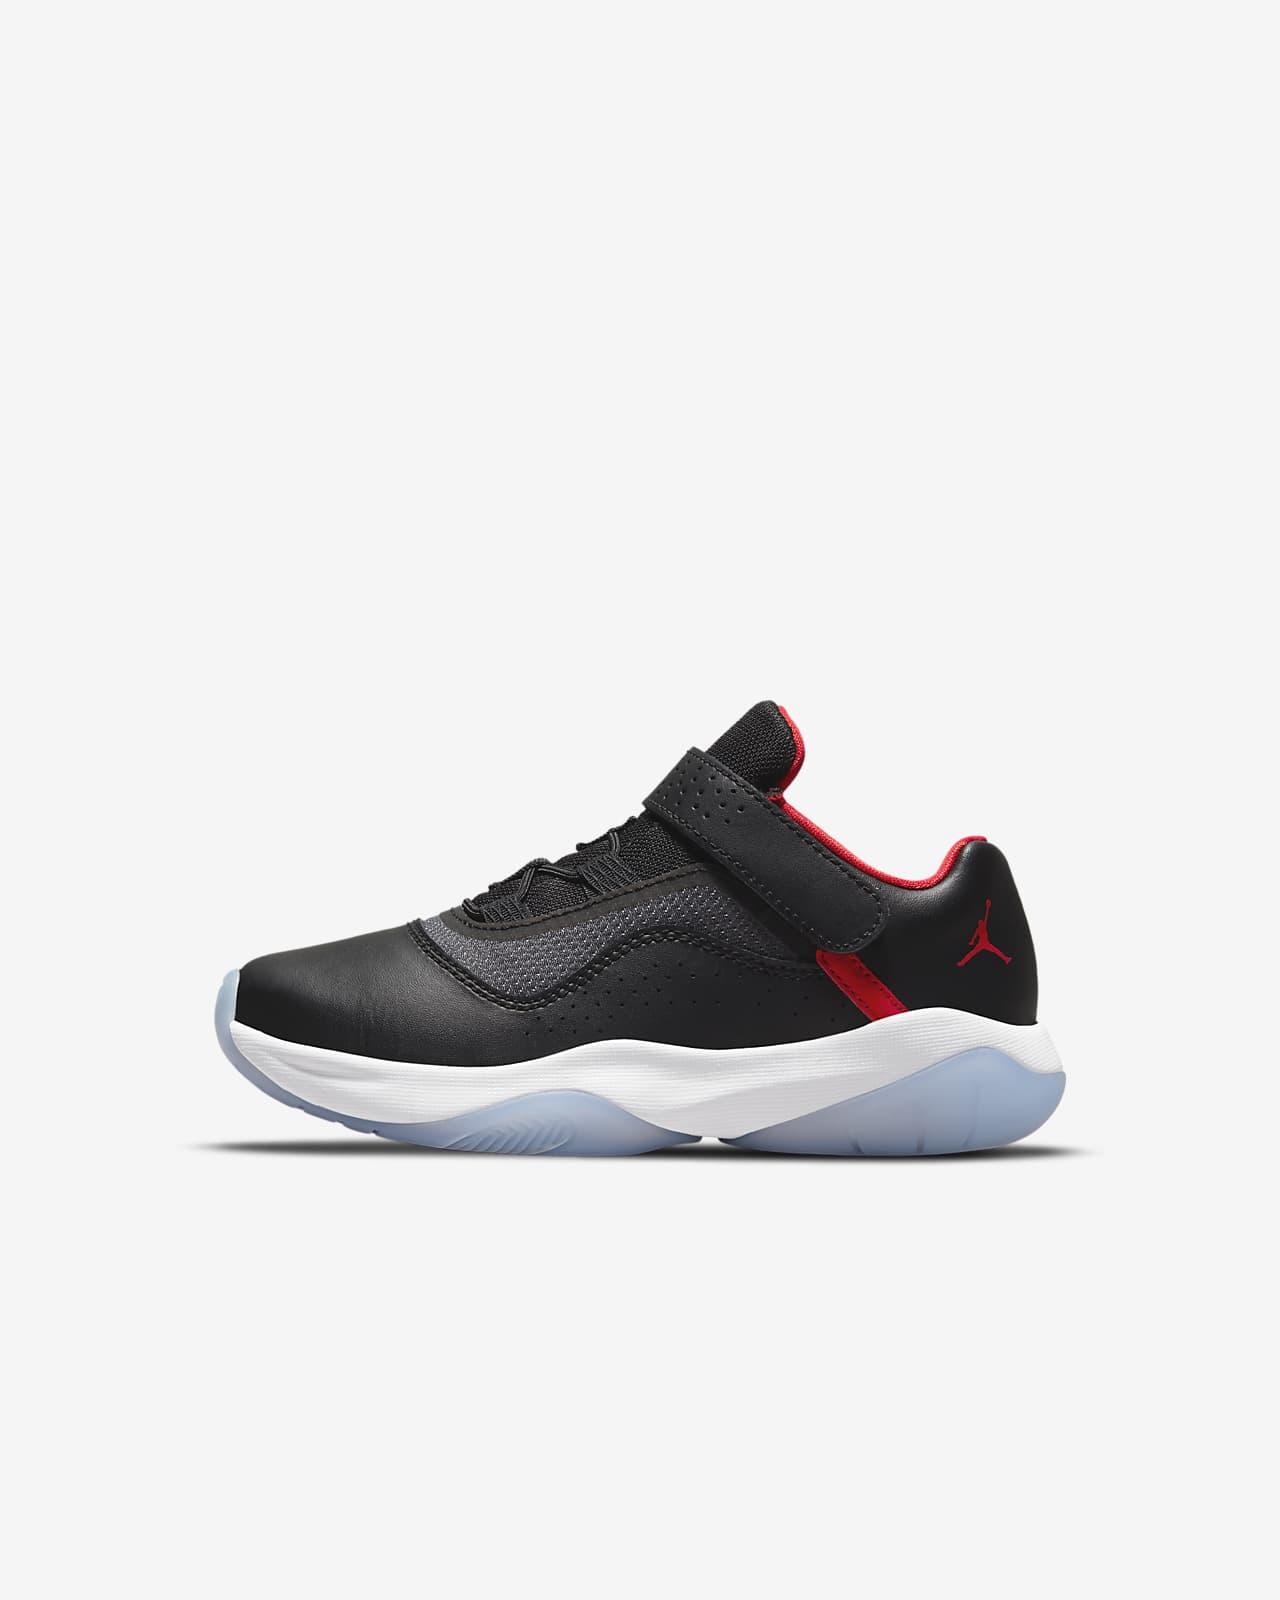 Jordan 11 CMFT Low Younger Kids' Shoes